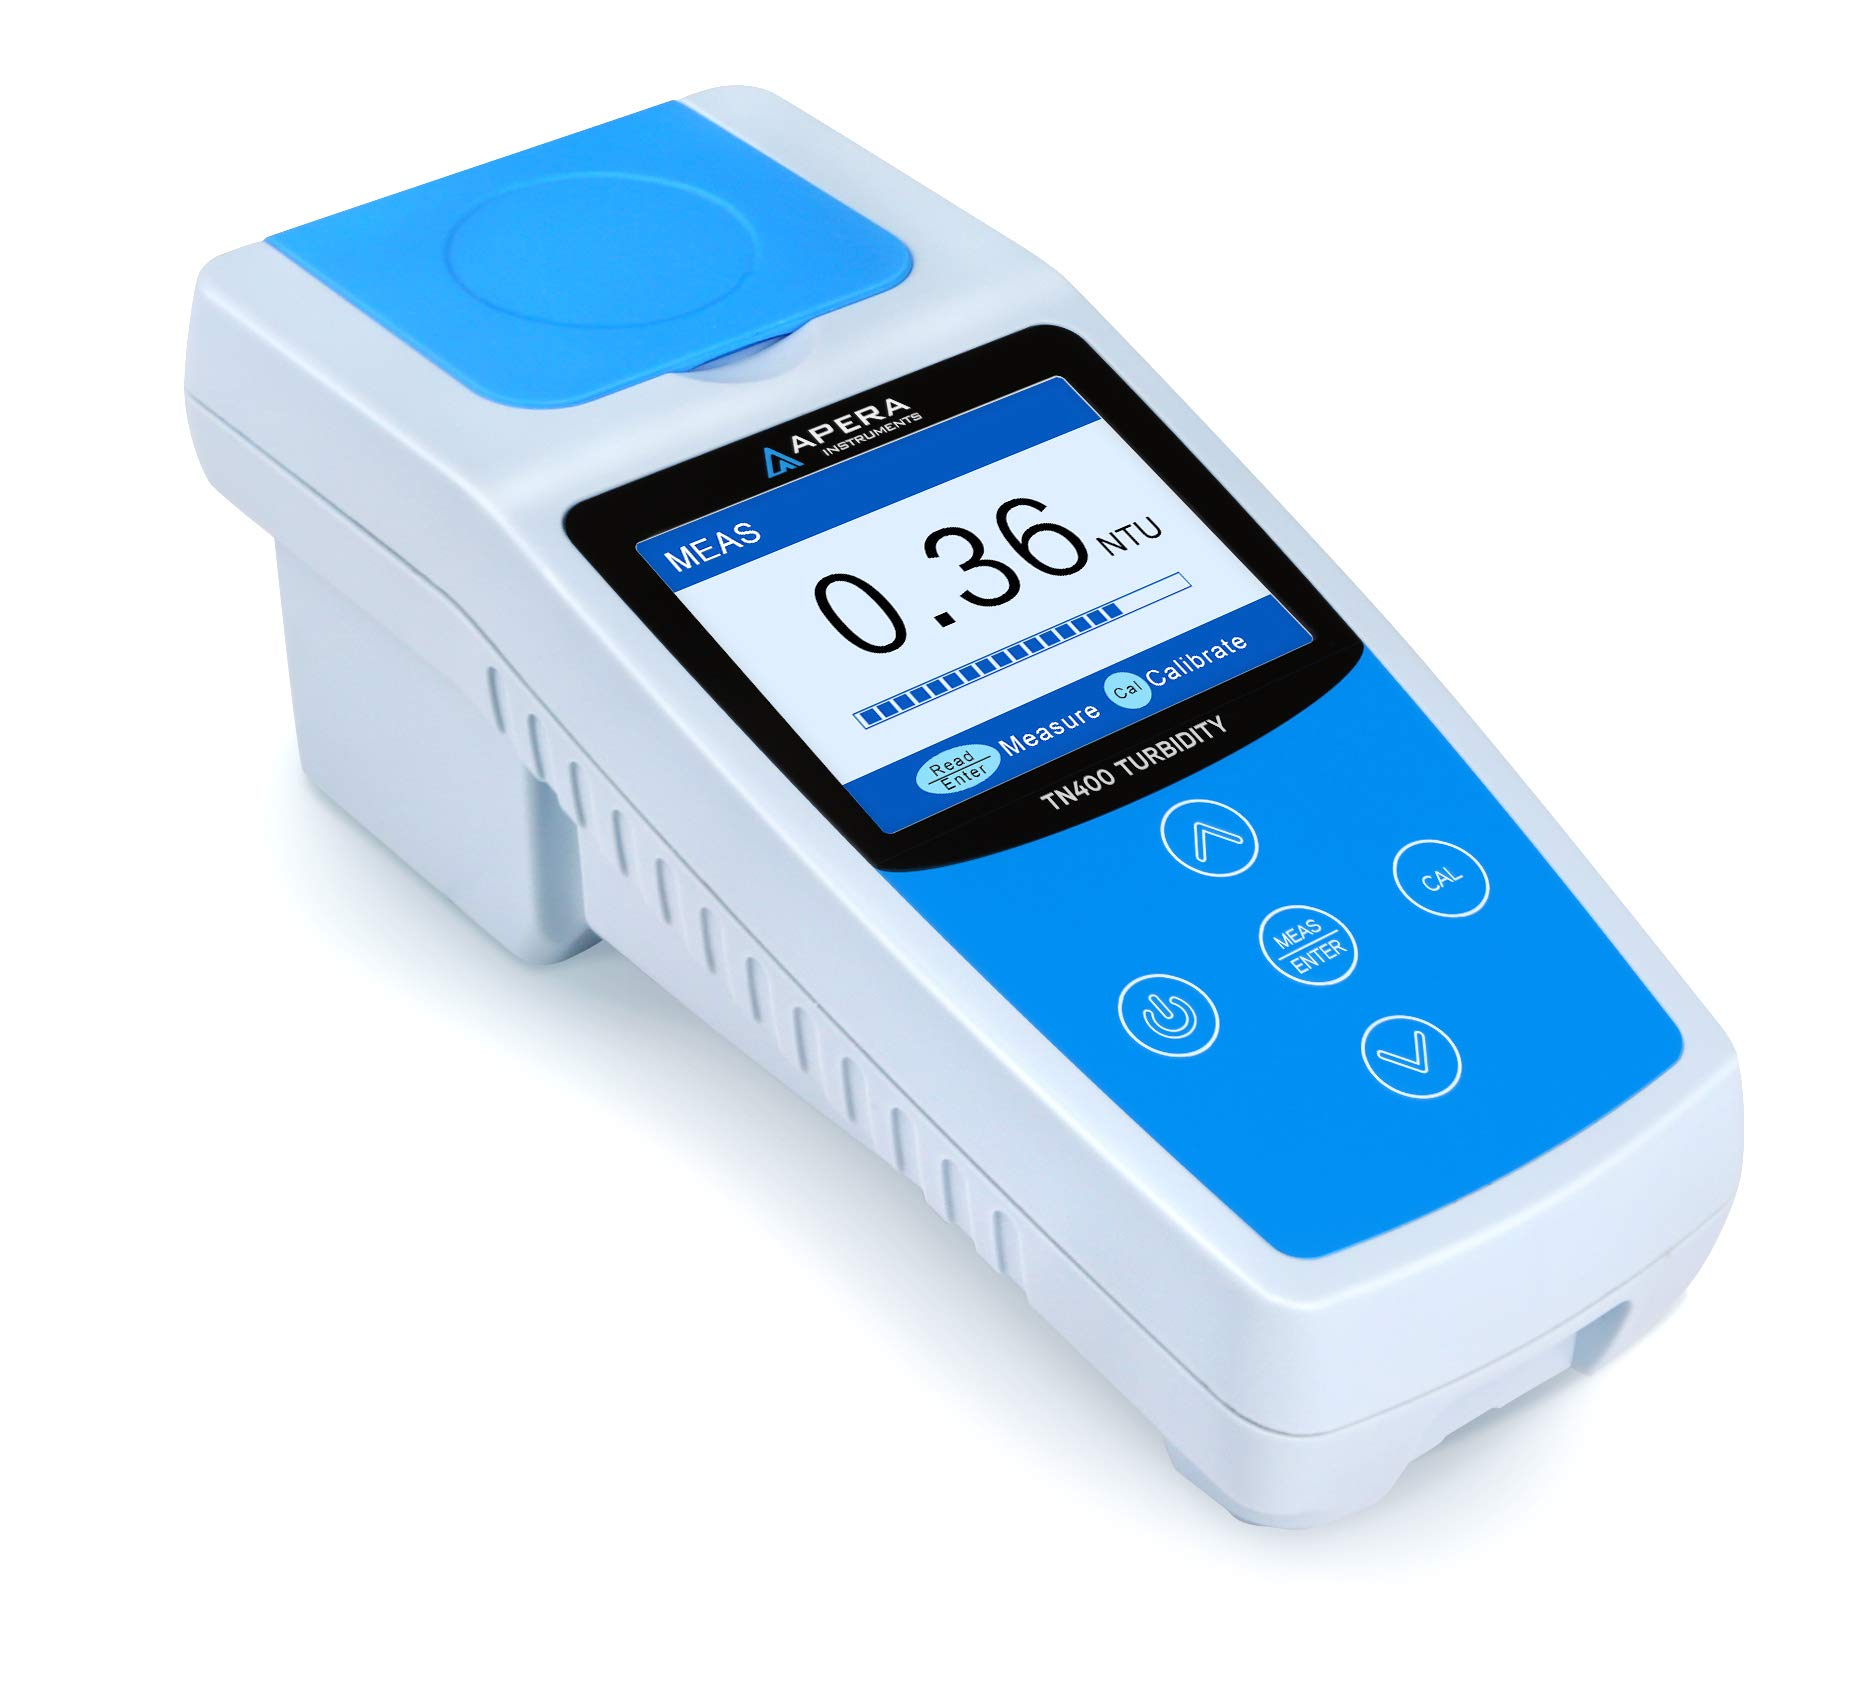 Apera Instruments TN400 Portable Turbidity Meter, Infrared Sensor, ISO 7027 Compliant, Accuracy: ±2%+Stray Light by Apera Instruments, LLC